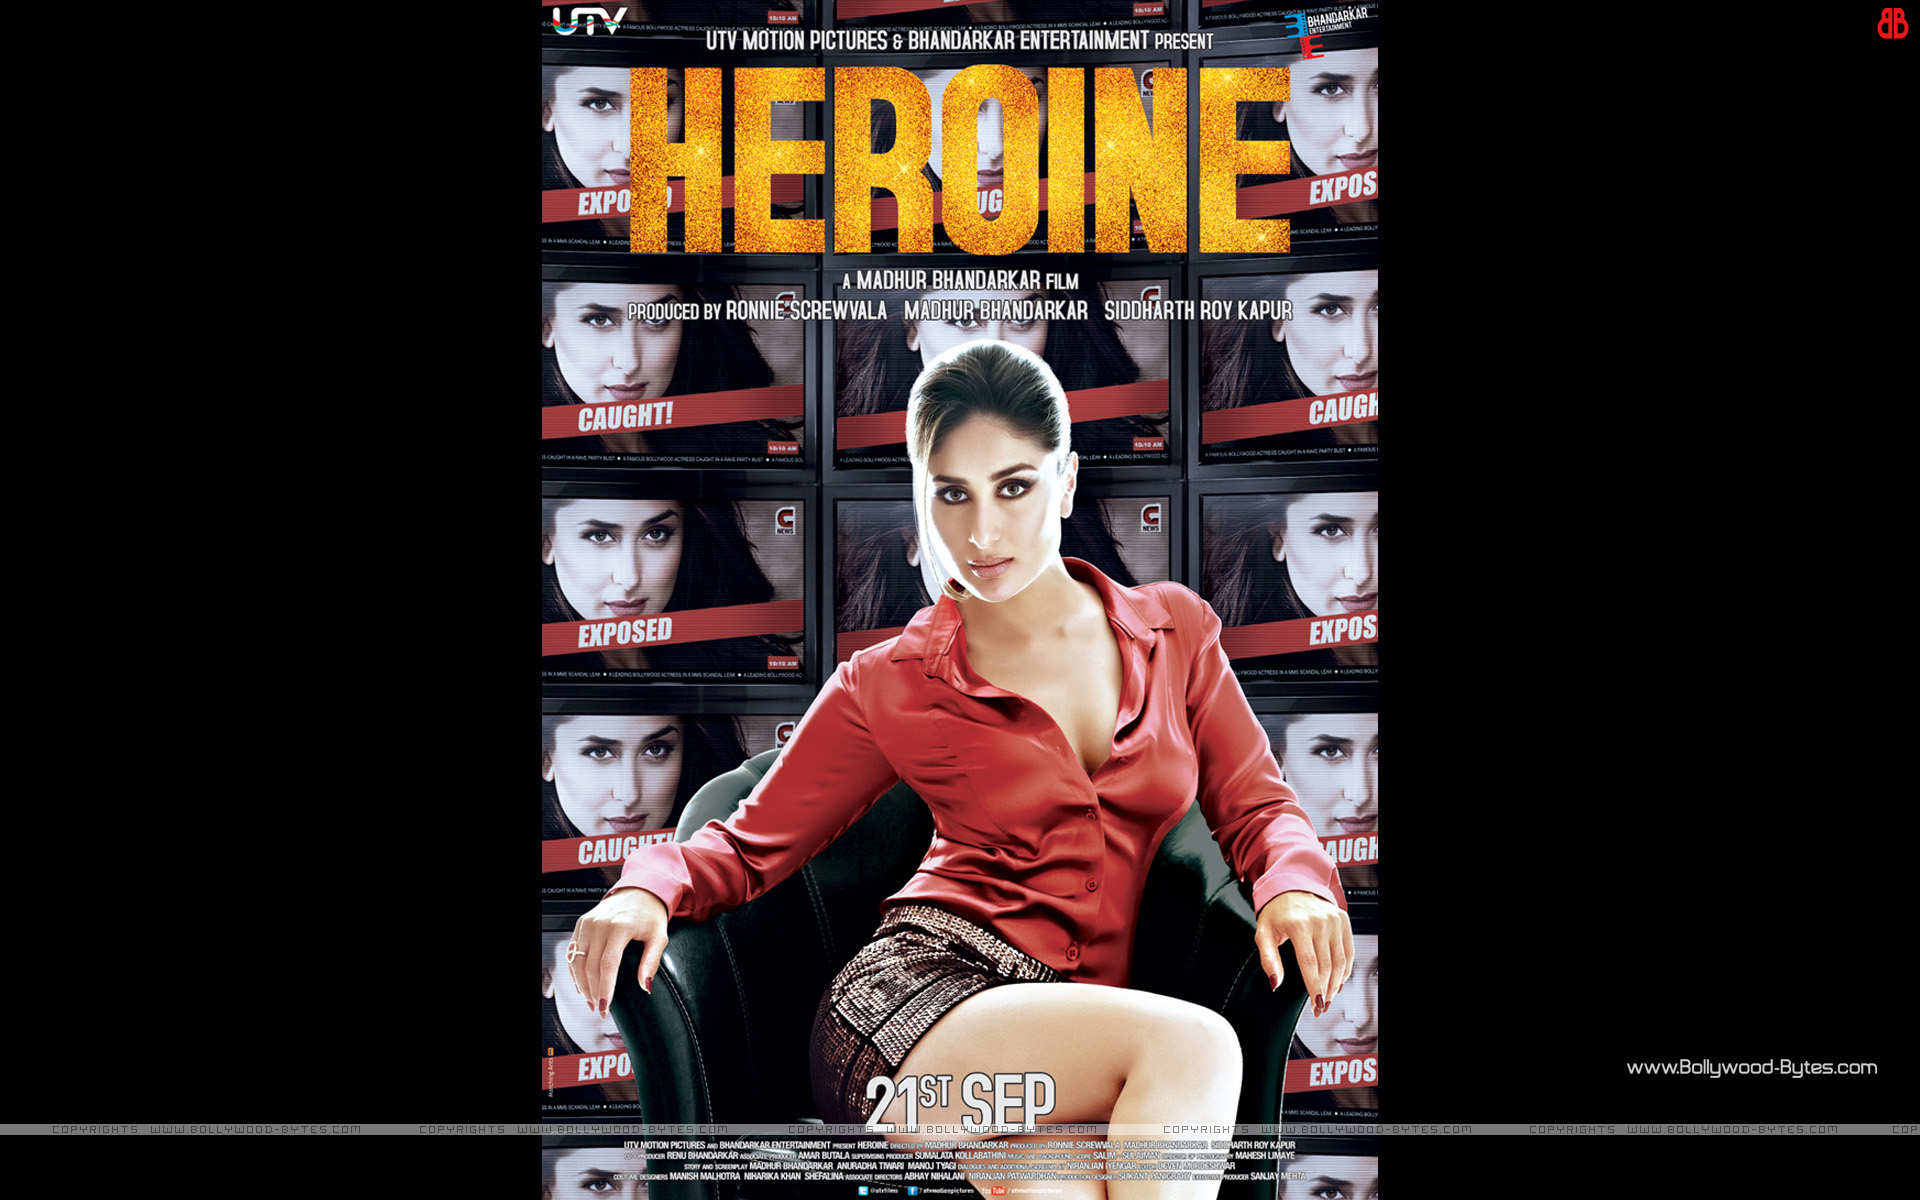 http://4.bp.blogspot.com/-07aH3TlVz6M/UF_kZvIeTjI/AAAAAAAAPkg/F4jaiKtg-Vo/s1920/Heroine-super-Kareena-Kapoor-HD-Wallpaper-20.jpg